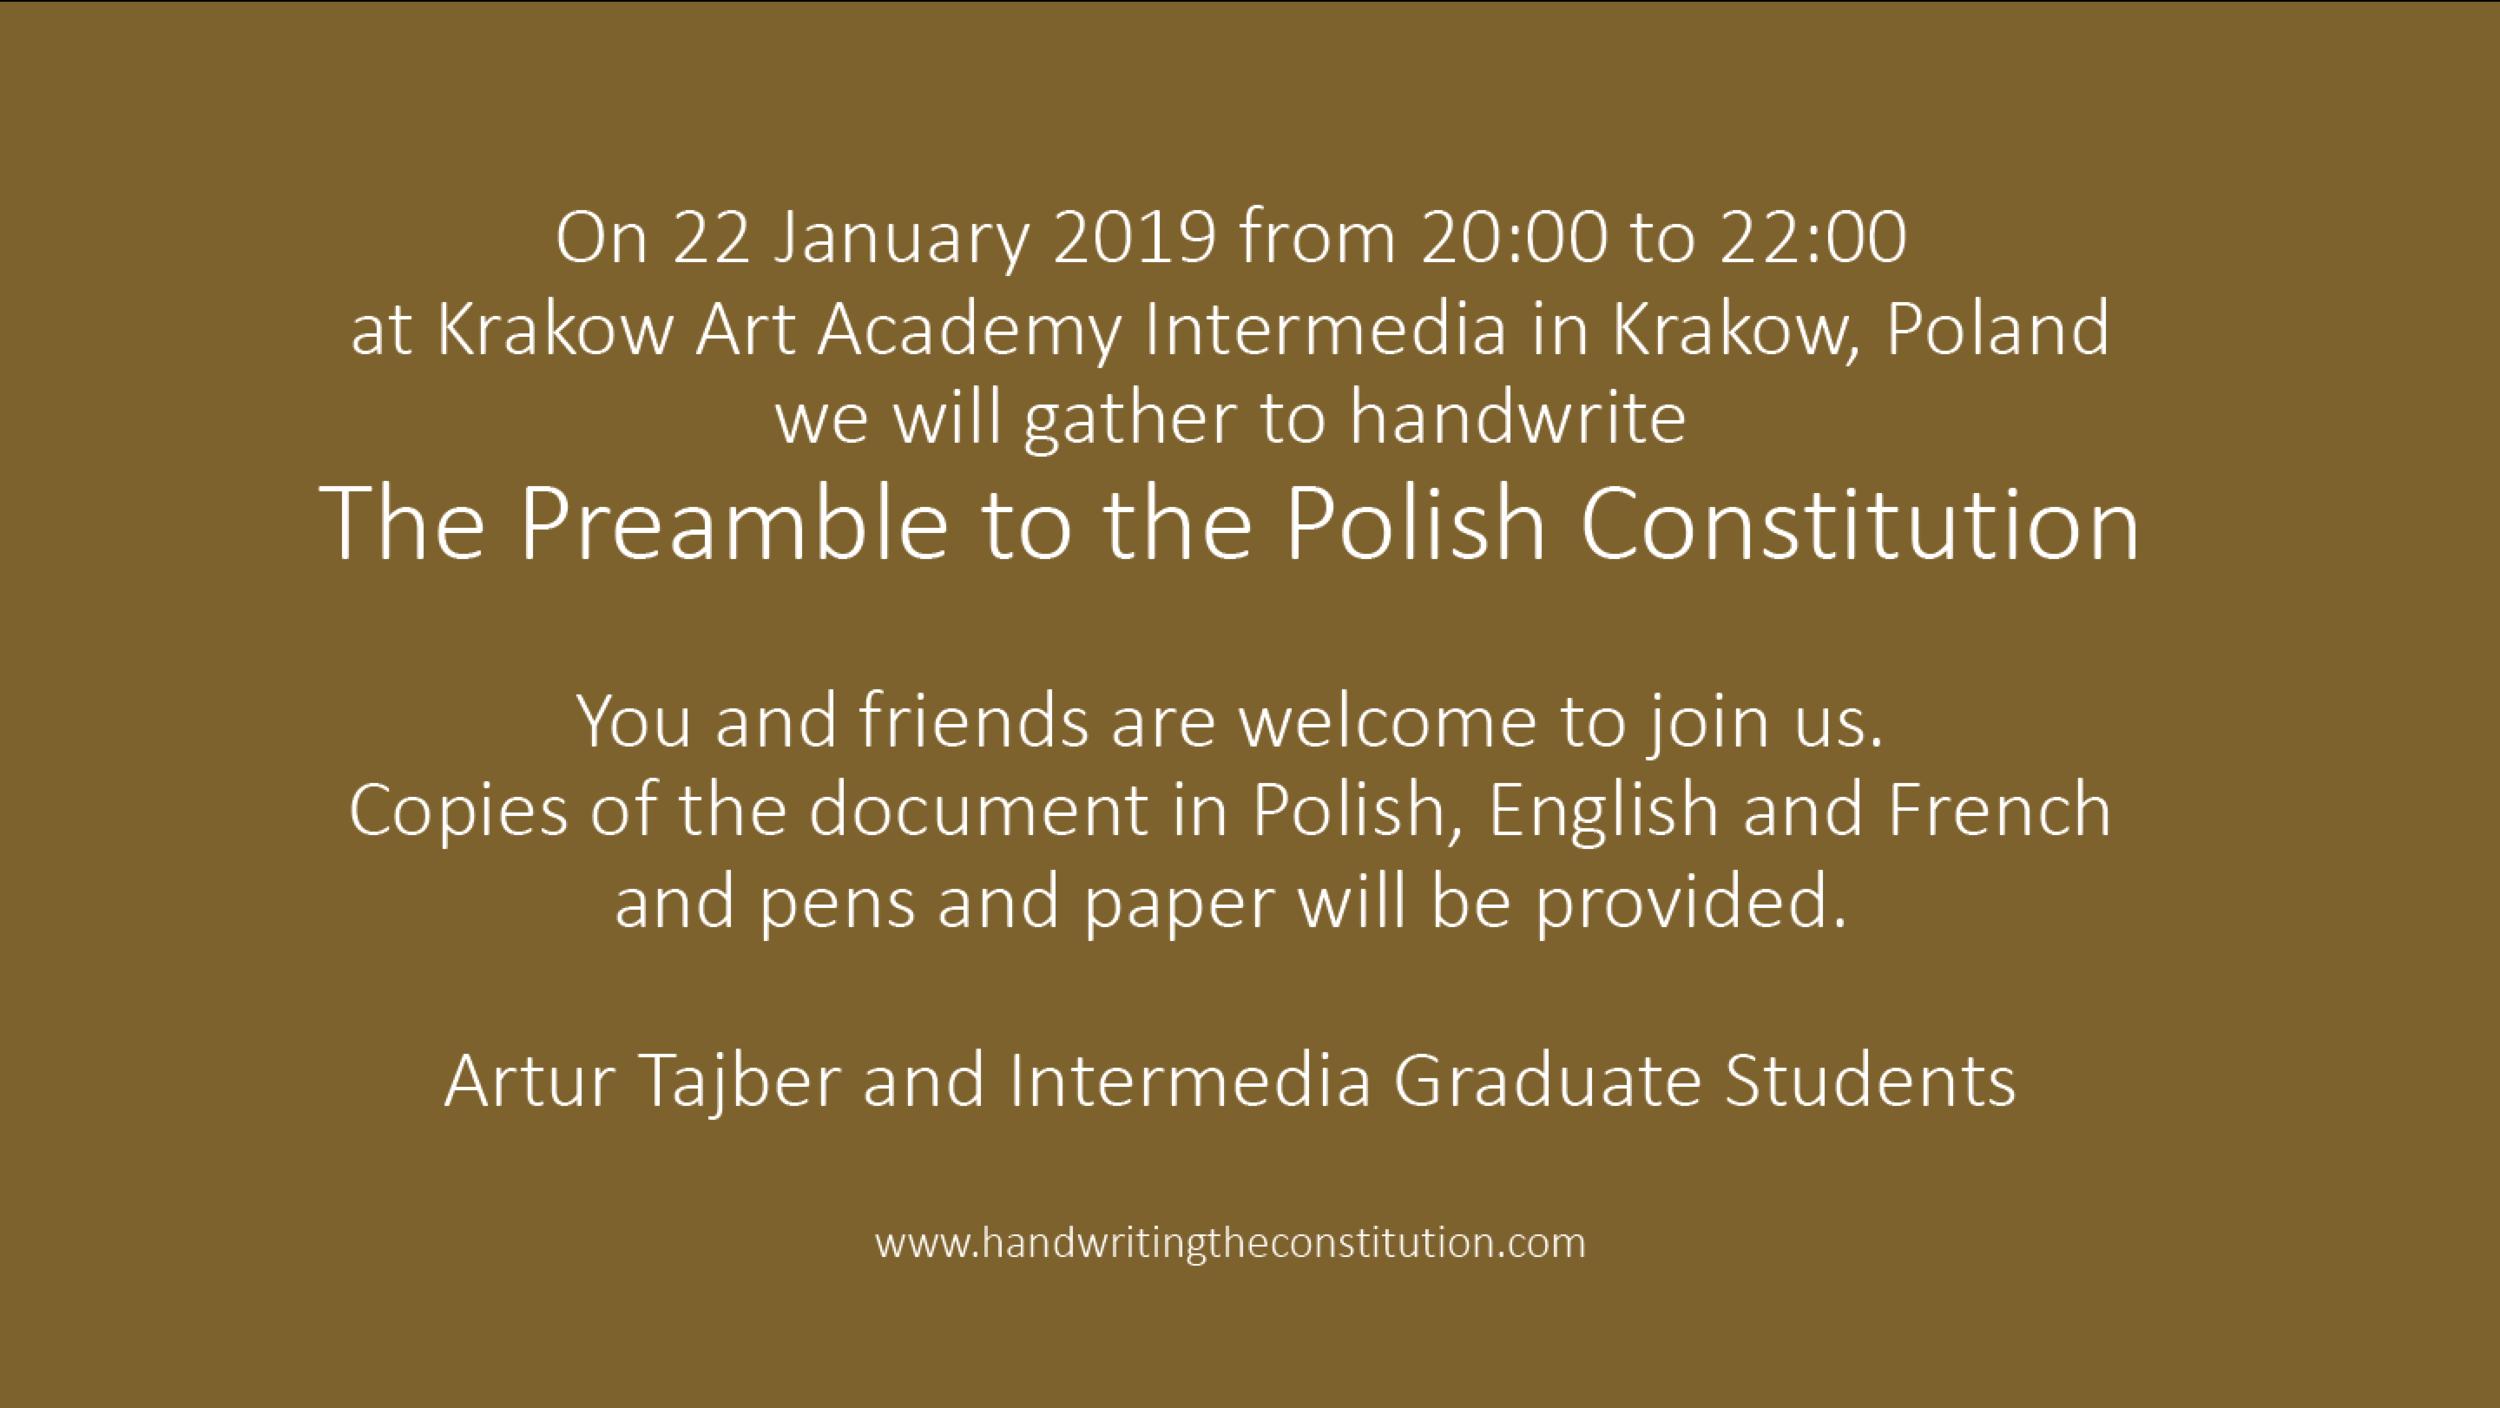 22 january 2019krakow, poland - Session 89collaborators artur tajber andintermedia graduate students